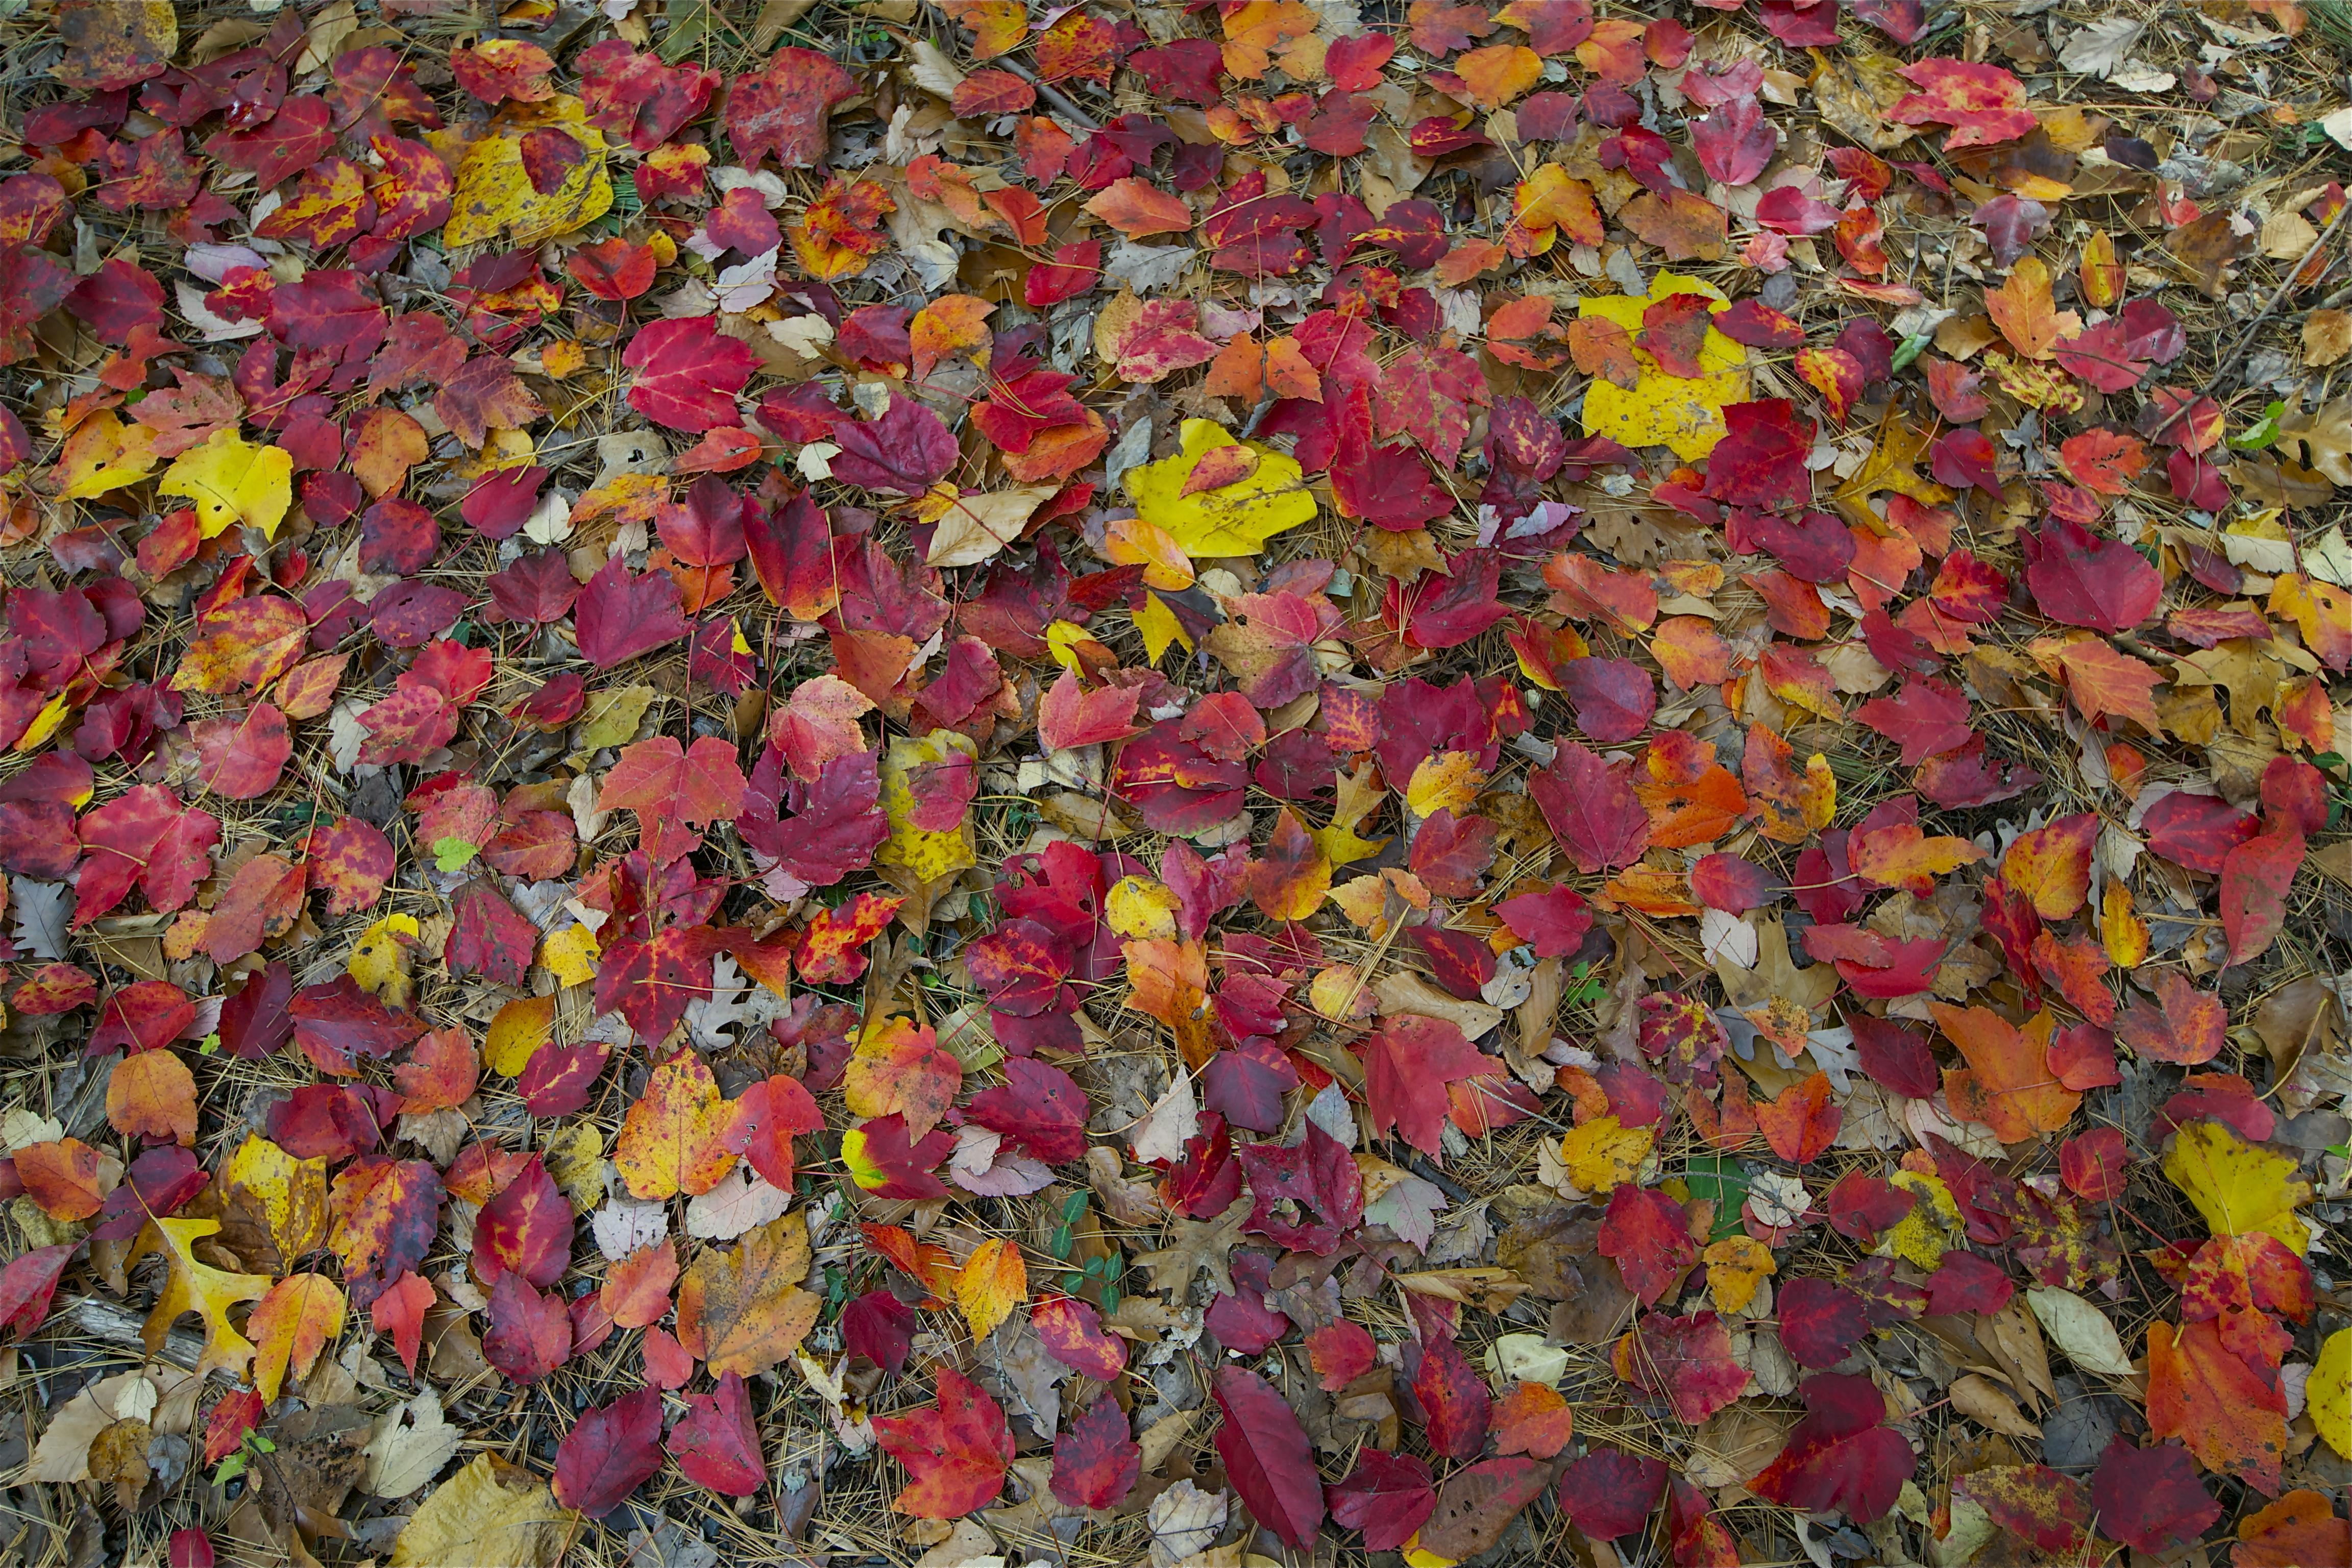 fallen leaves | Pops & Mojo Photos